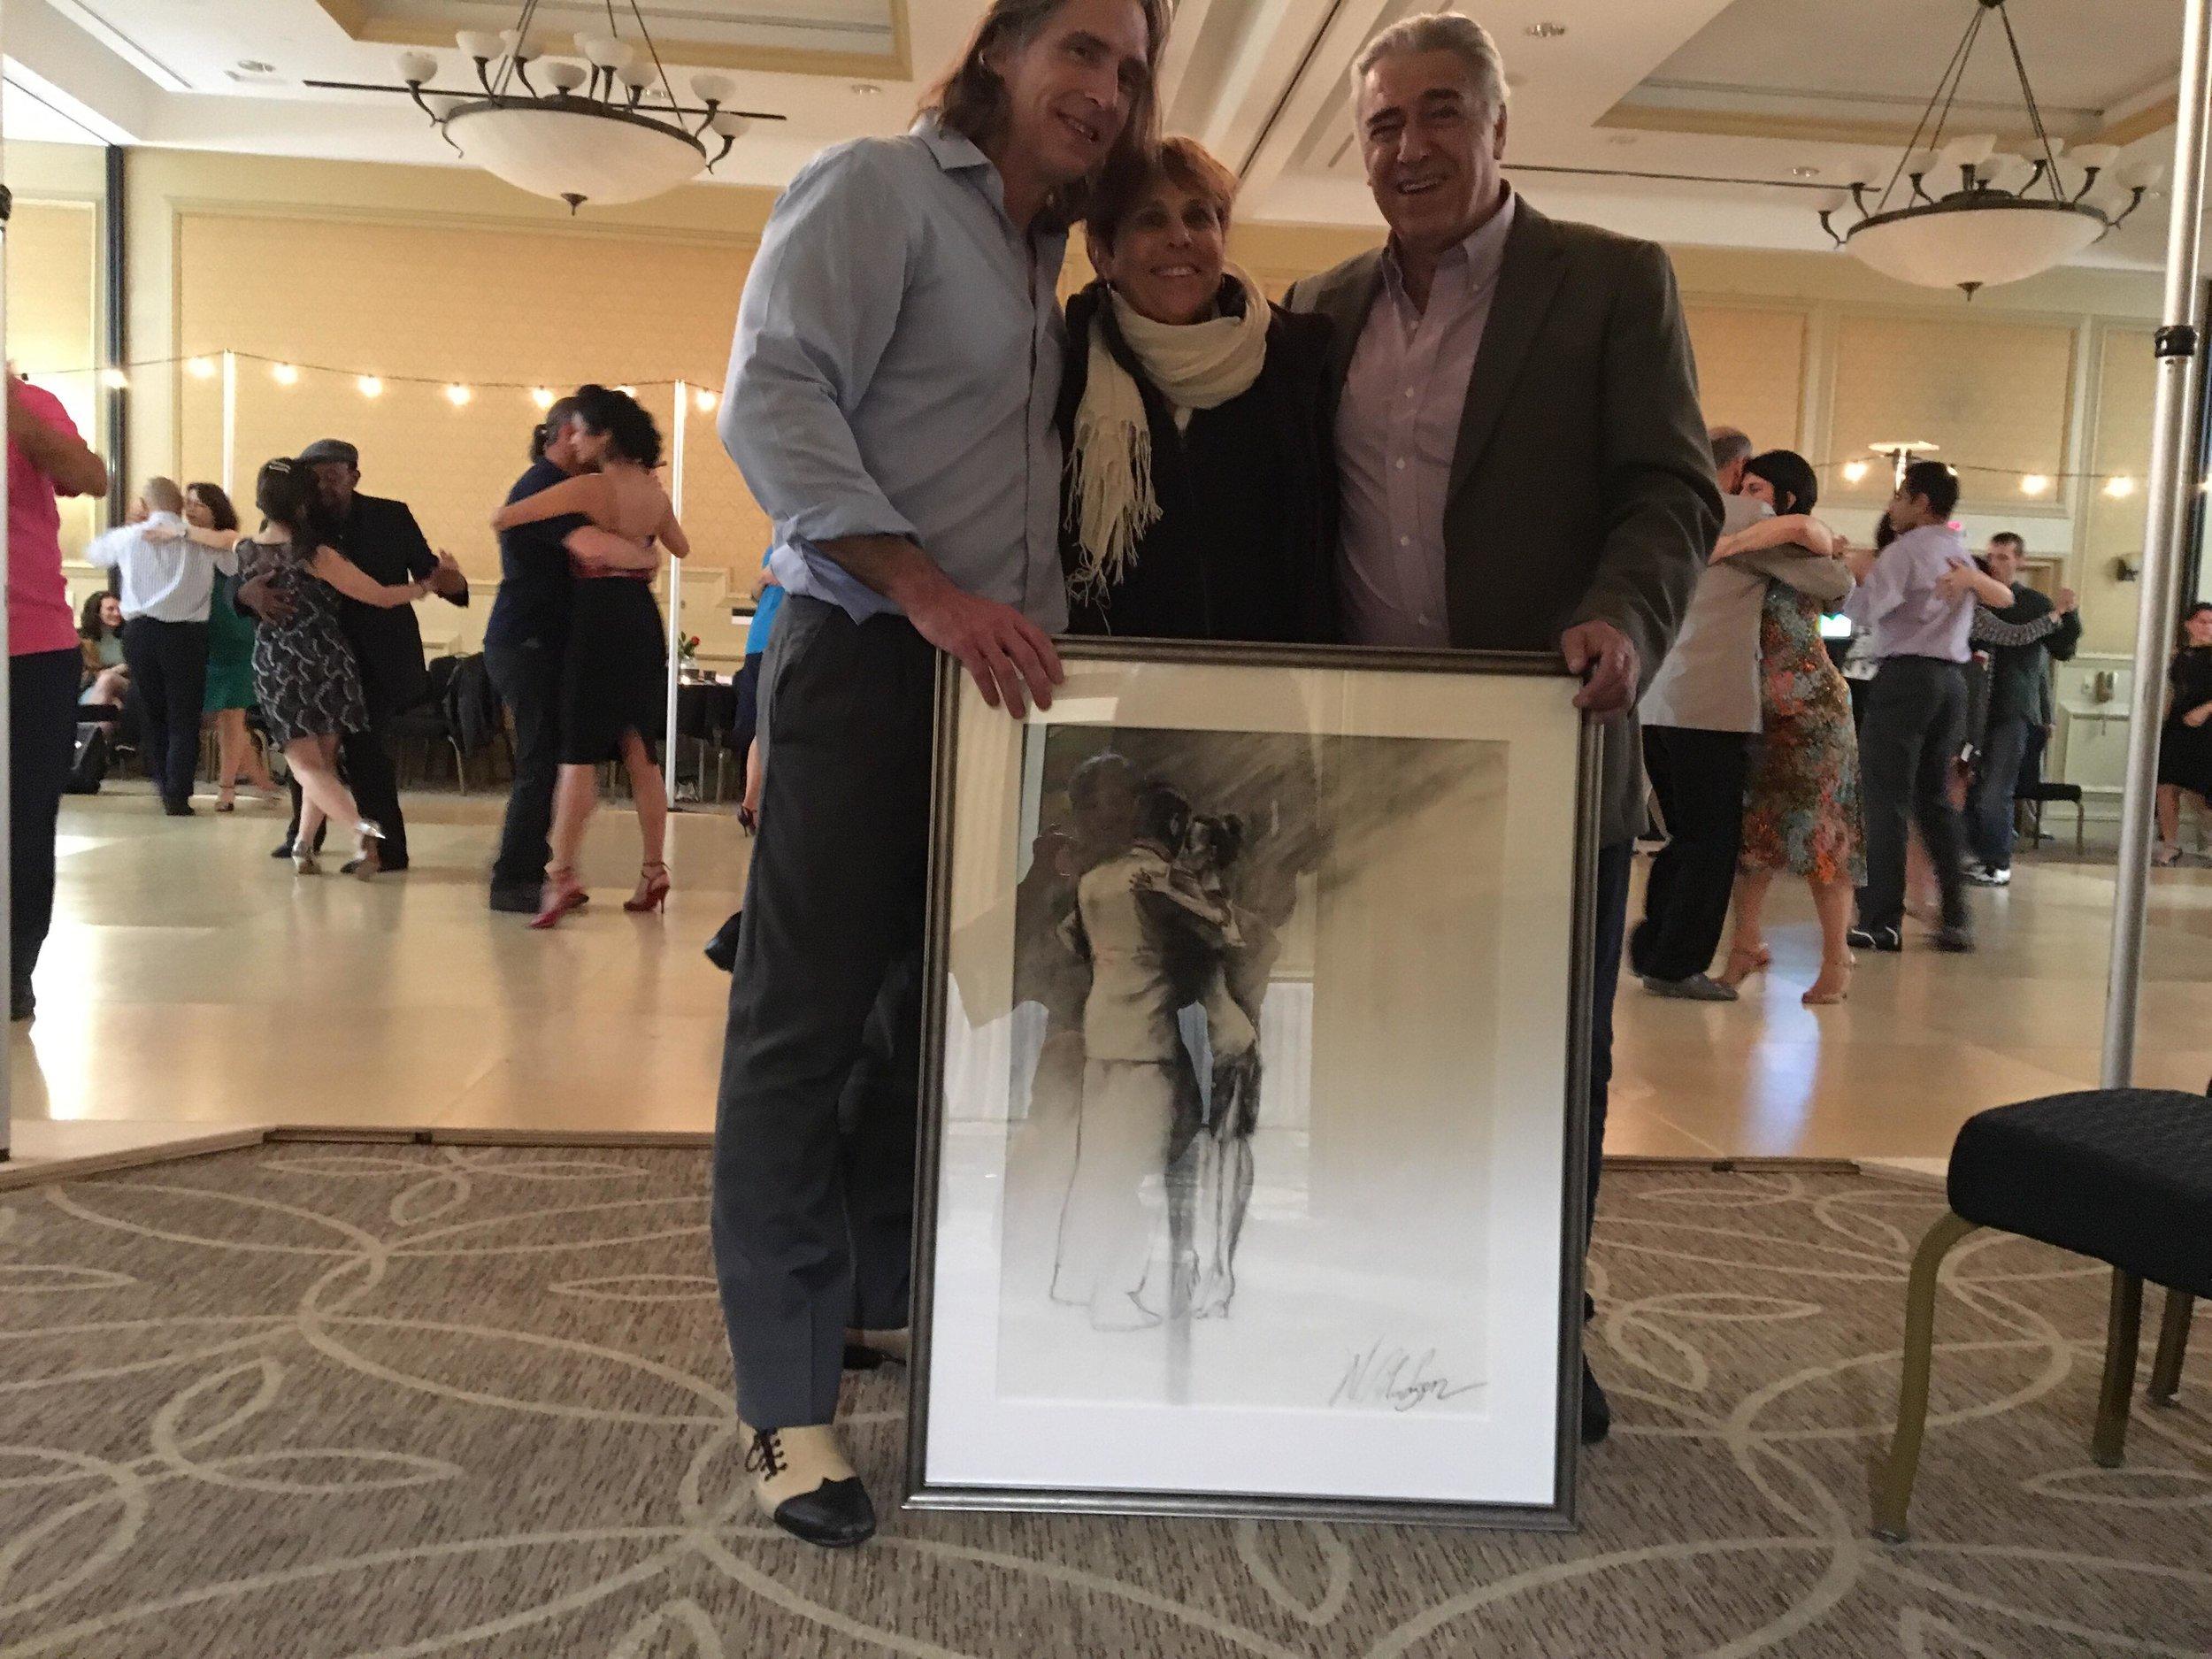 Milongueros win original tango art - W. Hudson raffles artwork at the Queen City Tango Marathon 2018